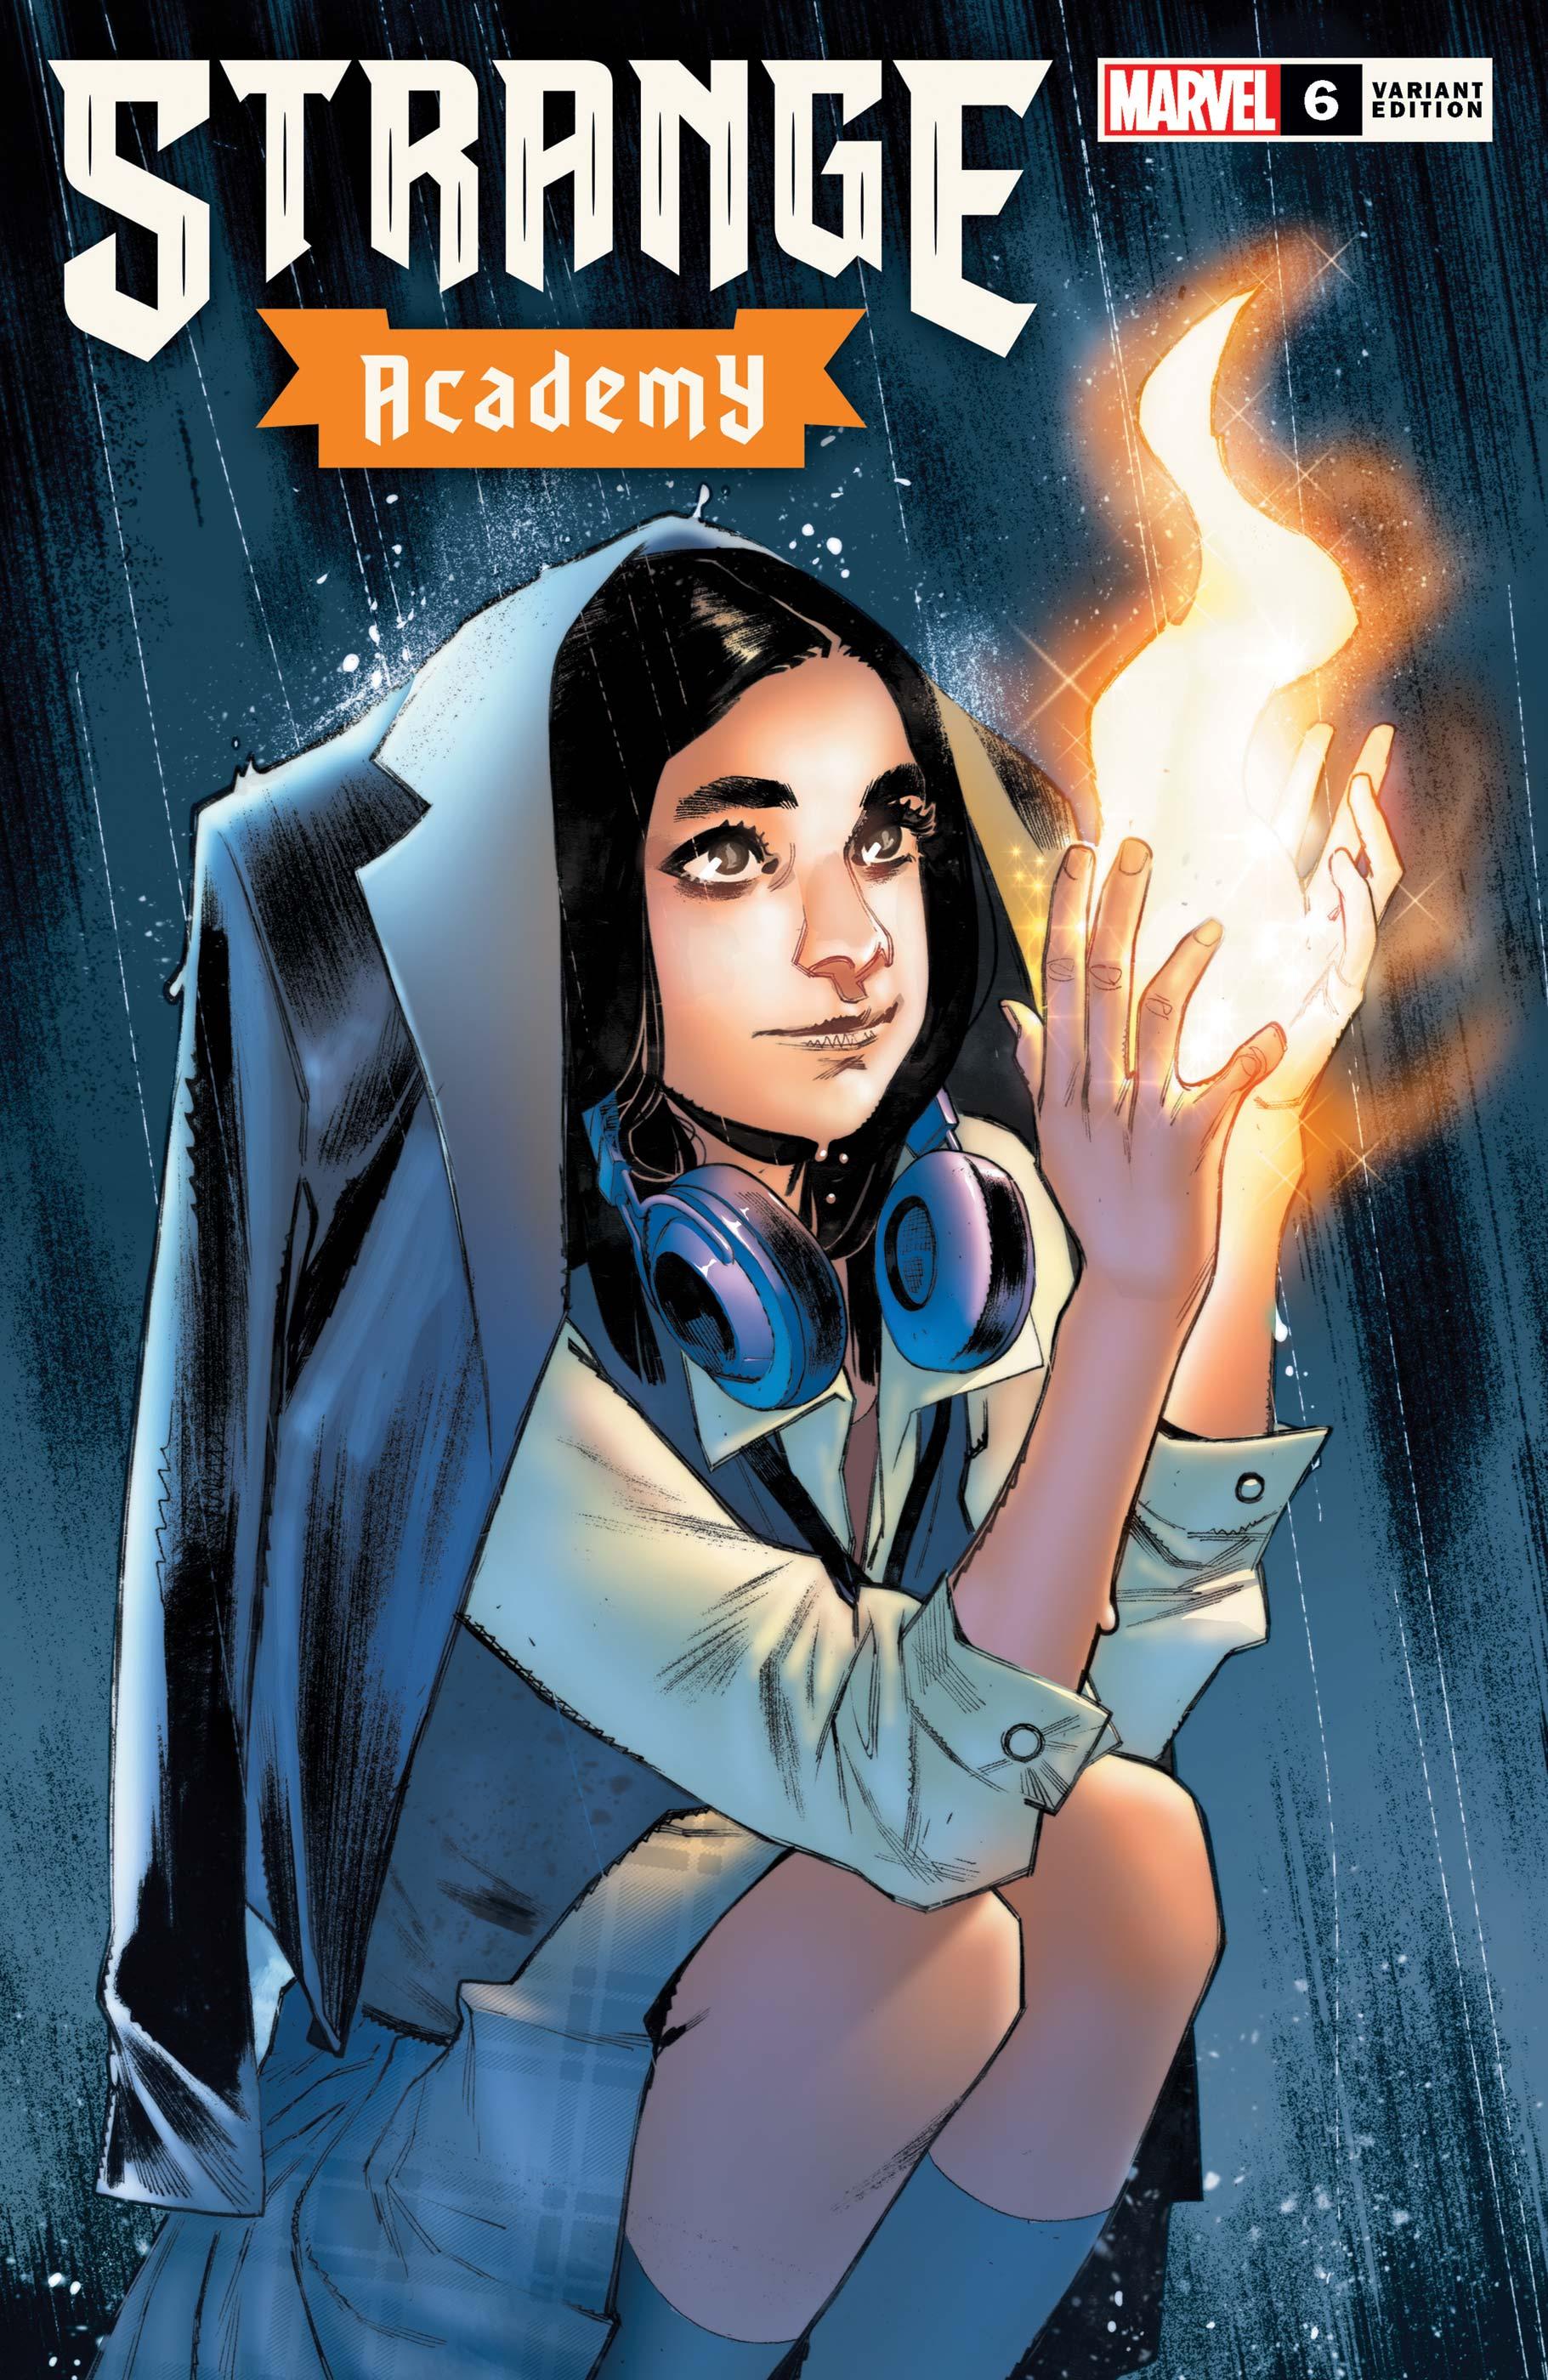 Strange Academy (2020) #6 (Variant)